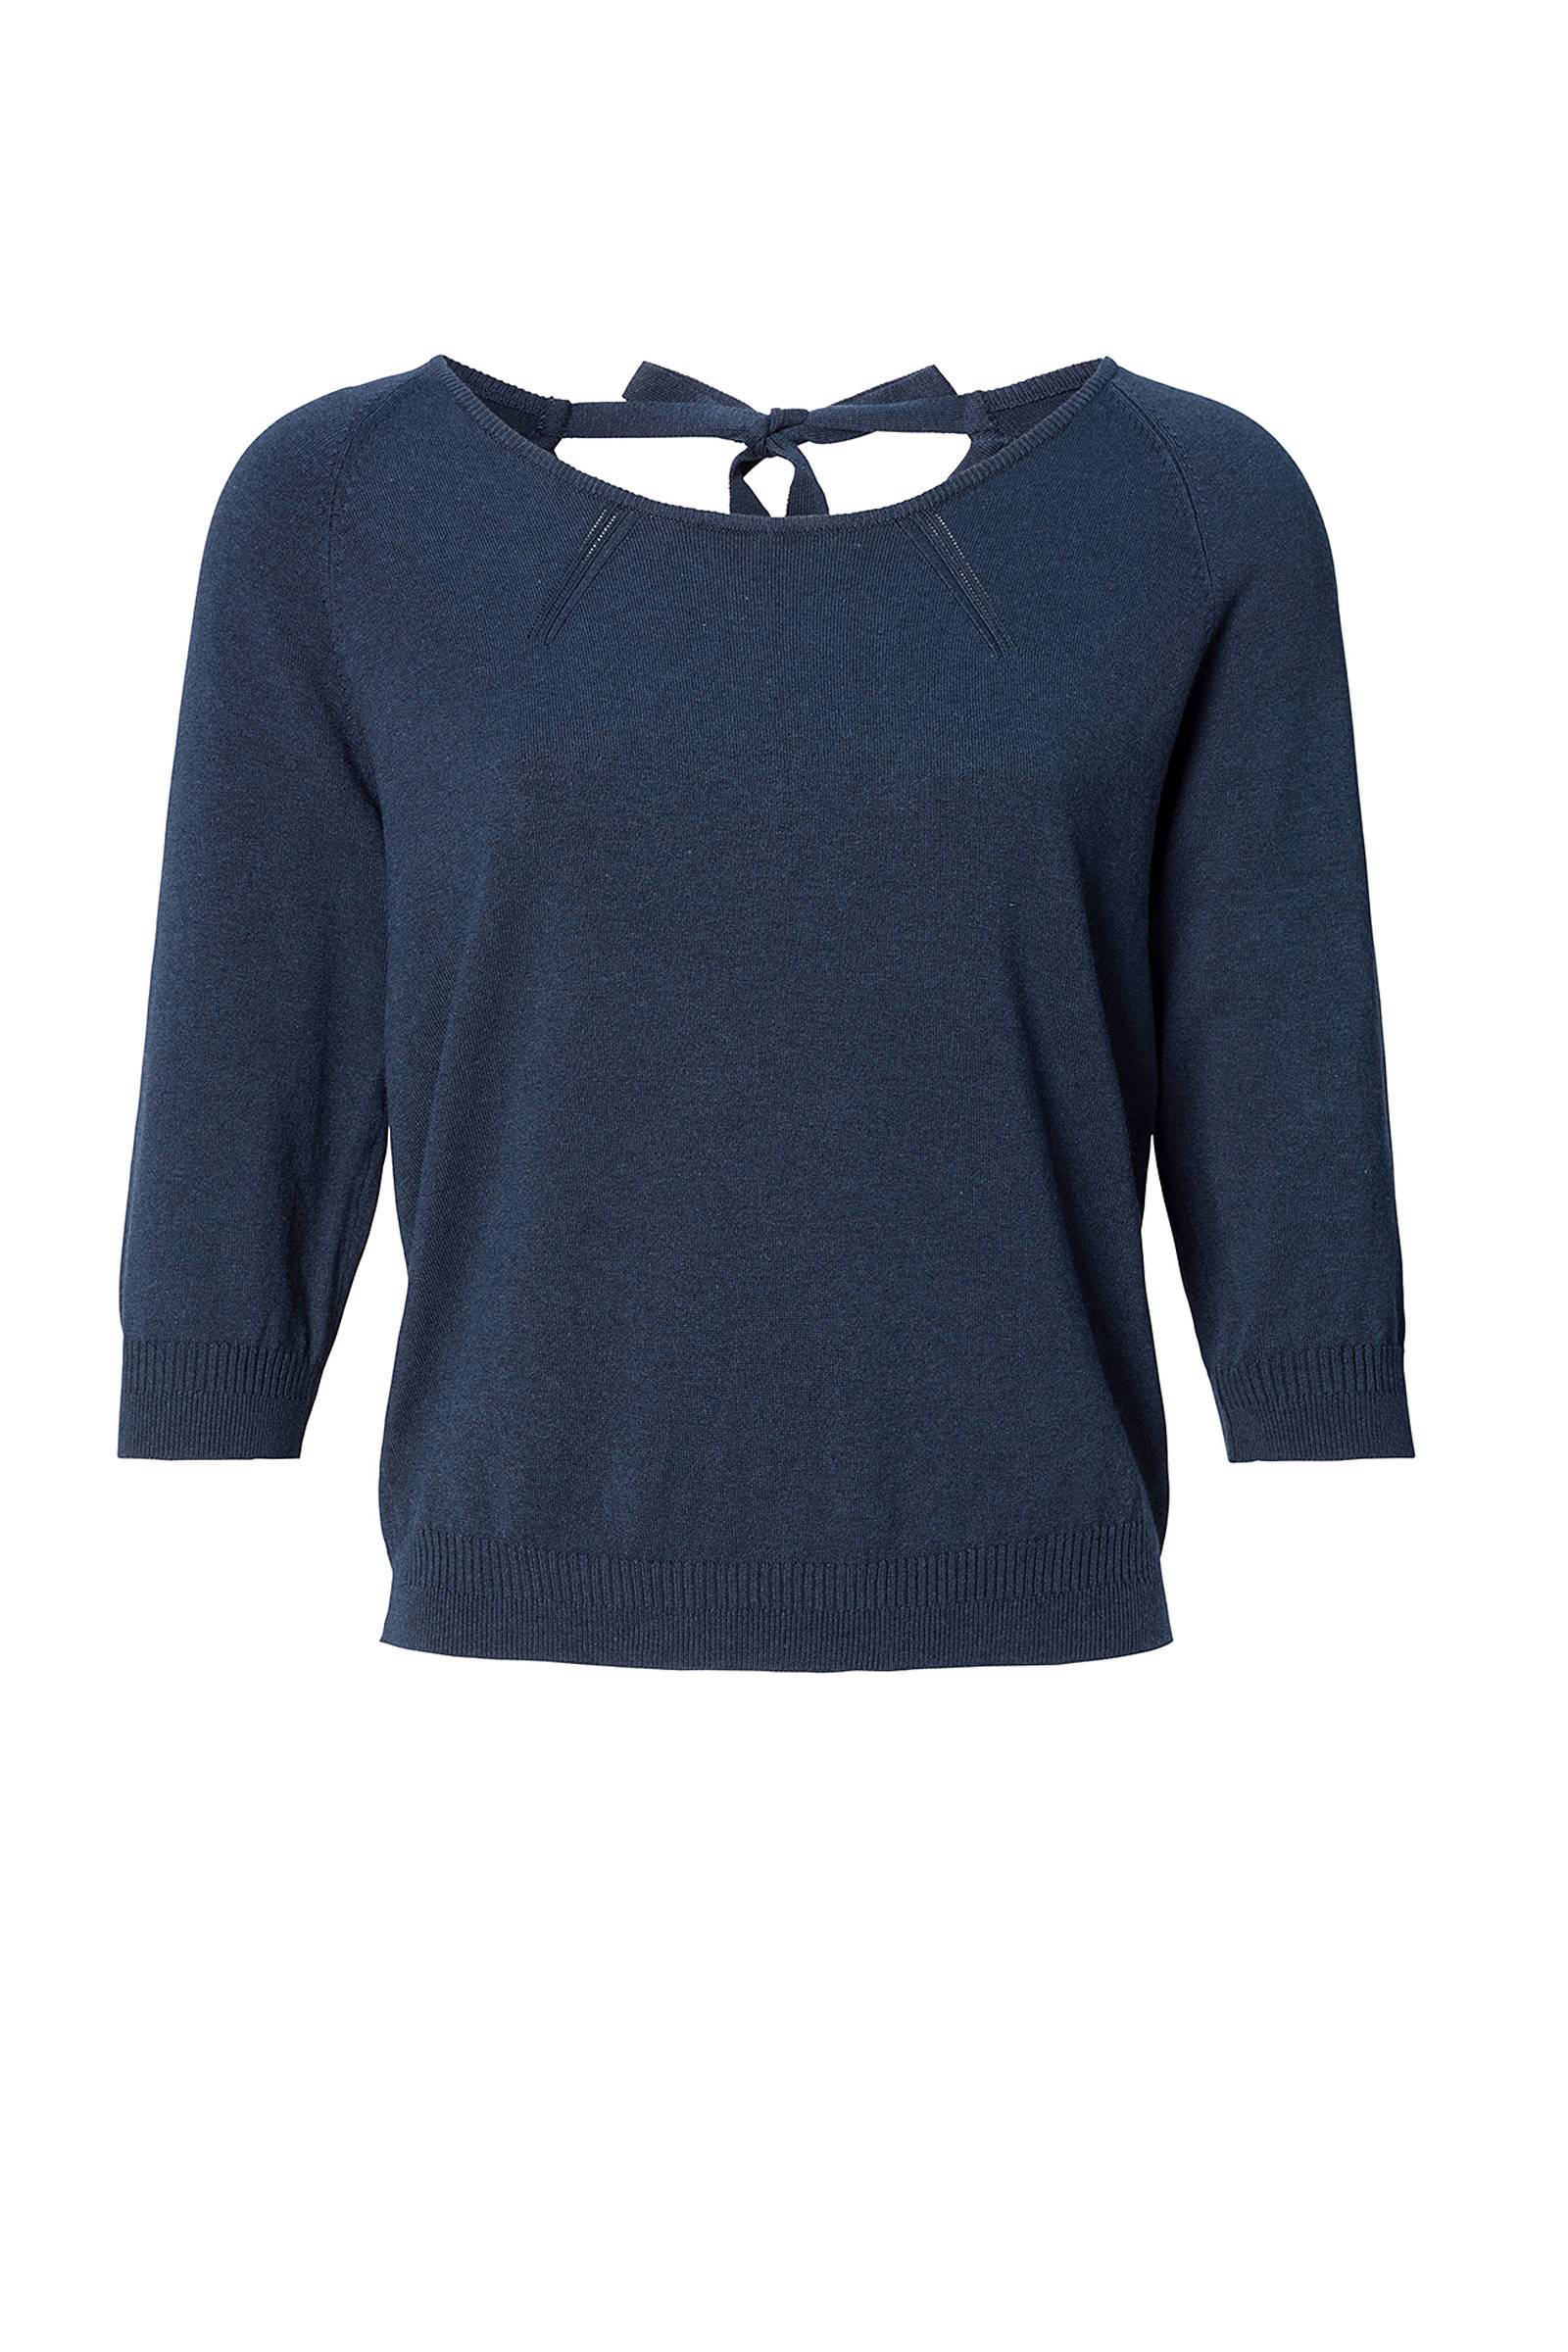 La Ligna trui donkerblauw | wehkamp